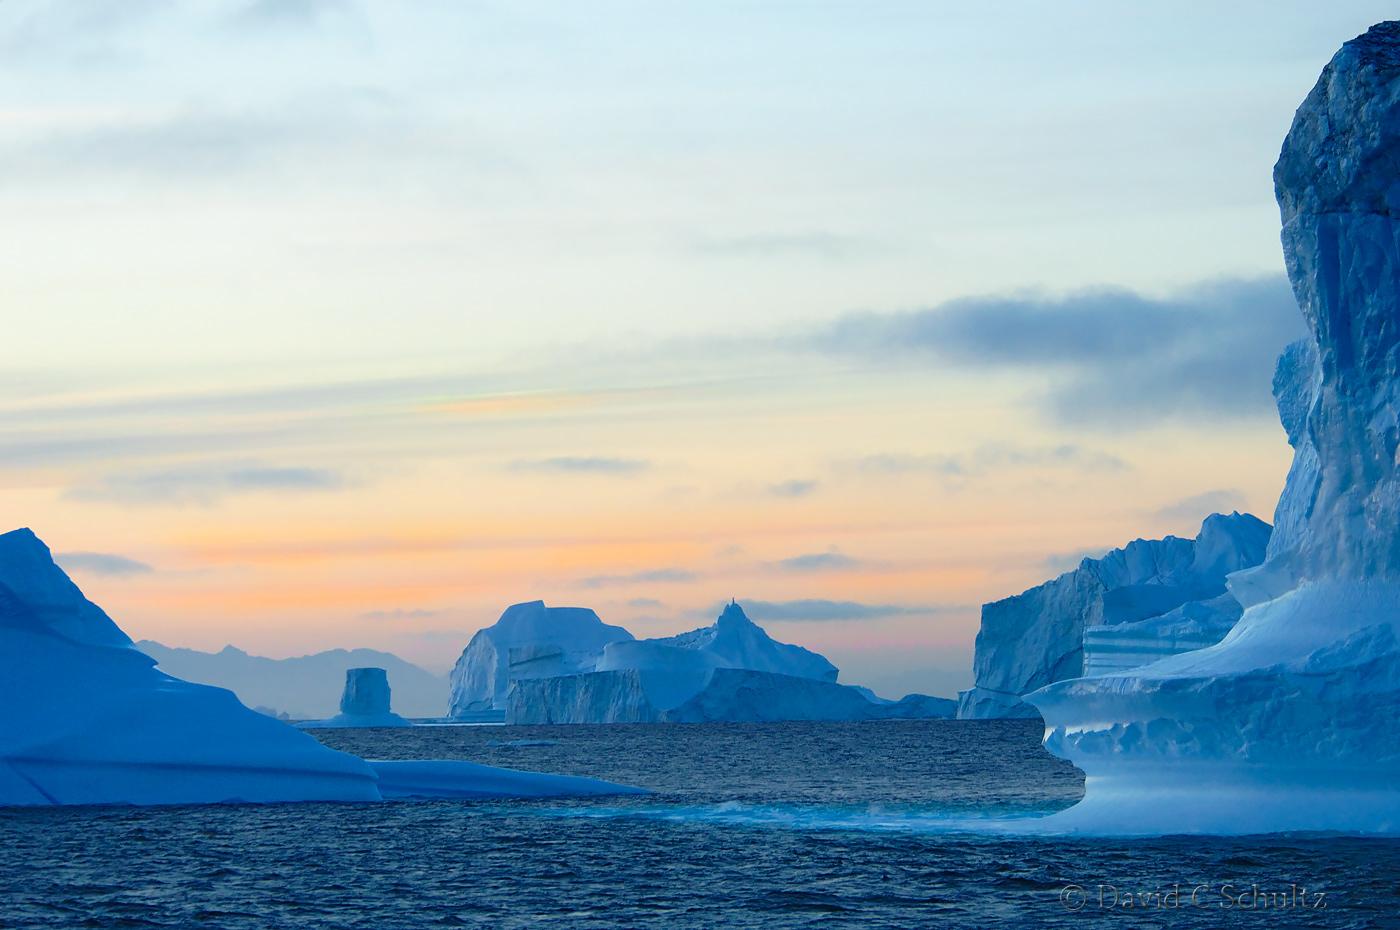 Iceberg at sunset in Scoresby Sund Fjord - Image #167-262